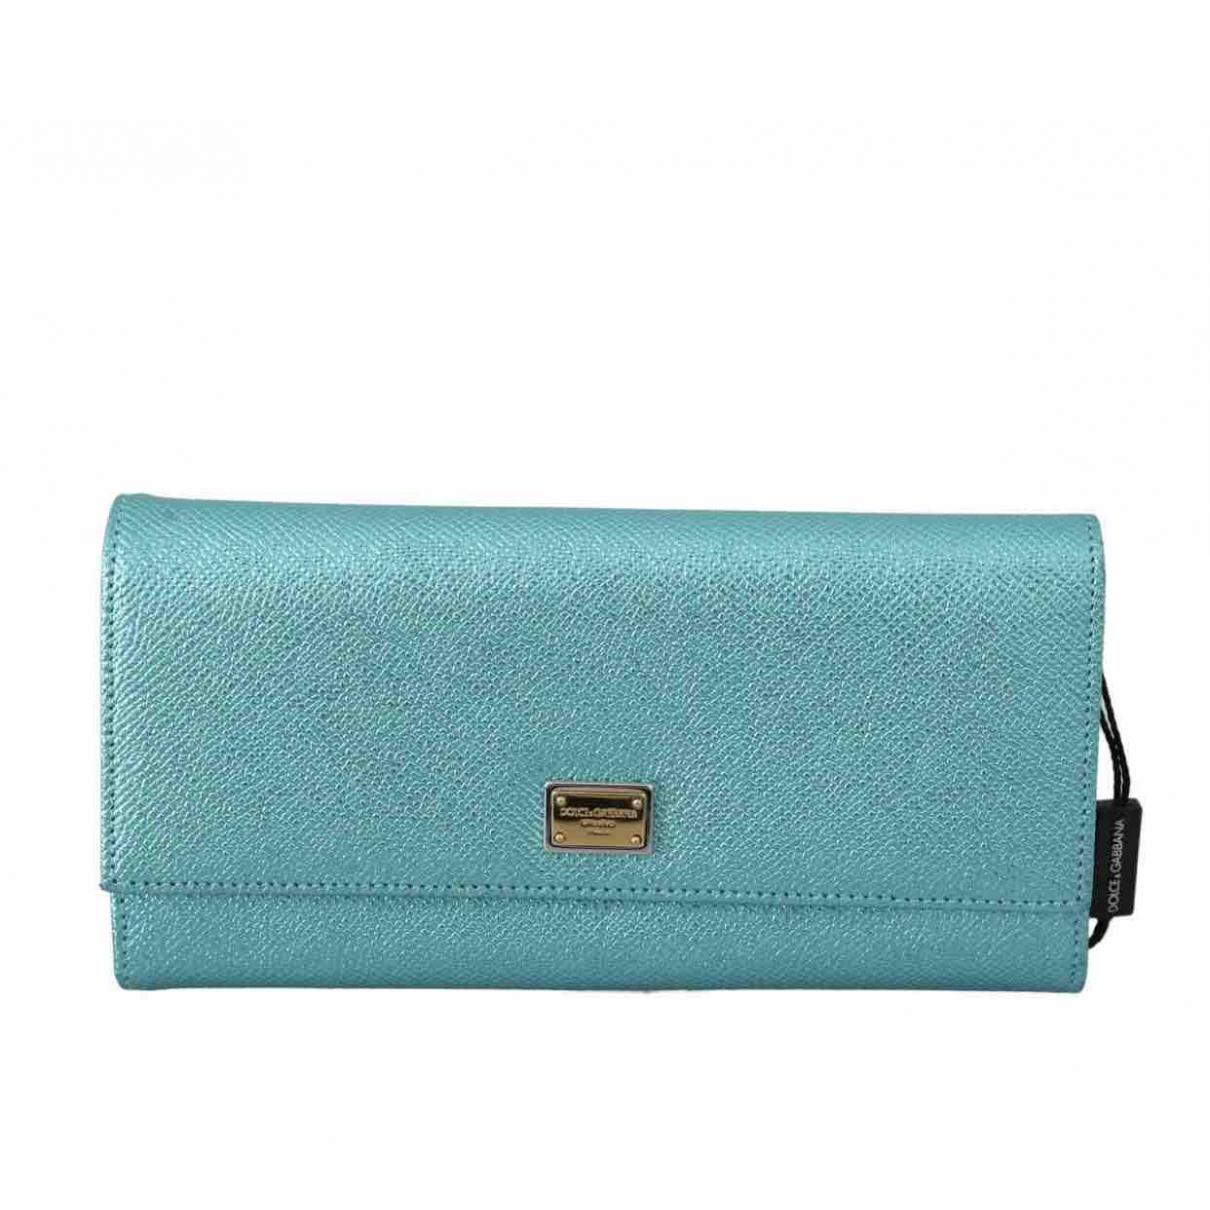 Dolce & Gabbana - Portefeuille   pour femme en cuir - bleu